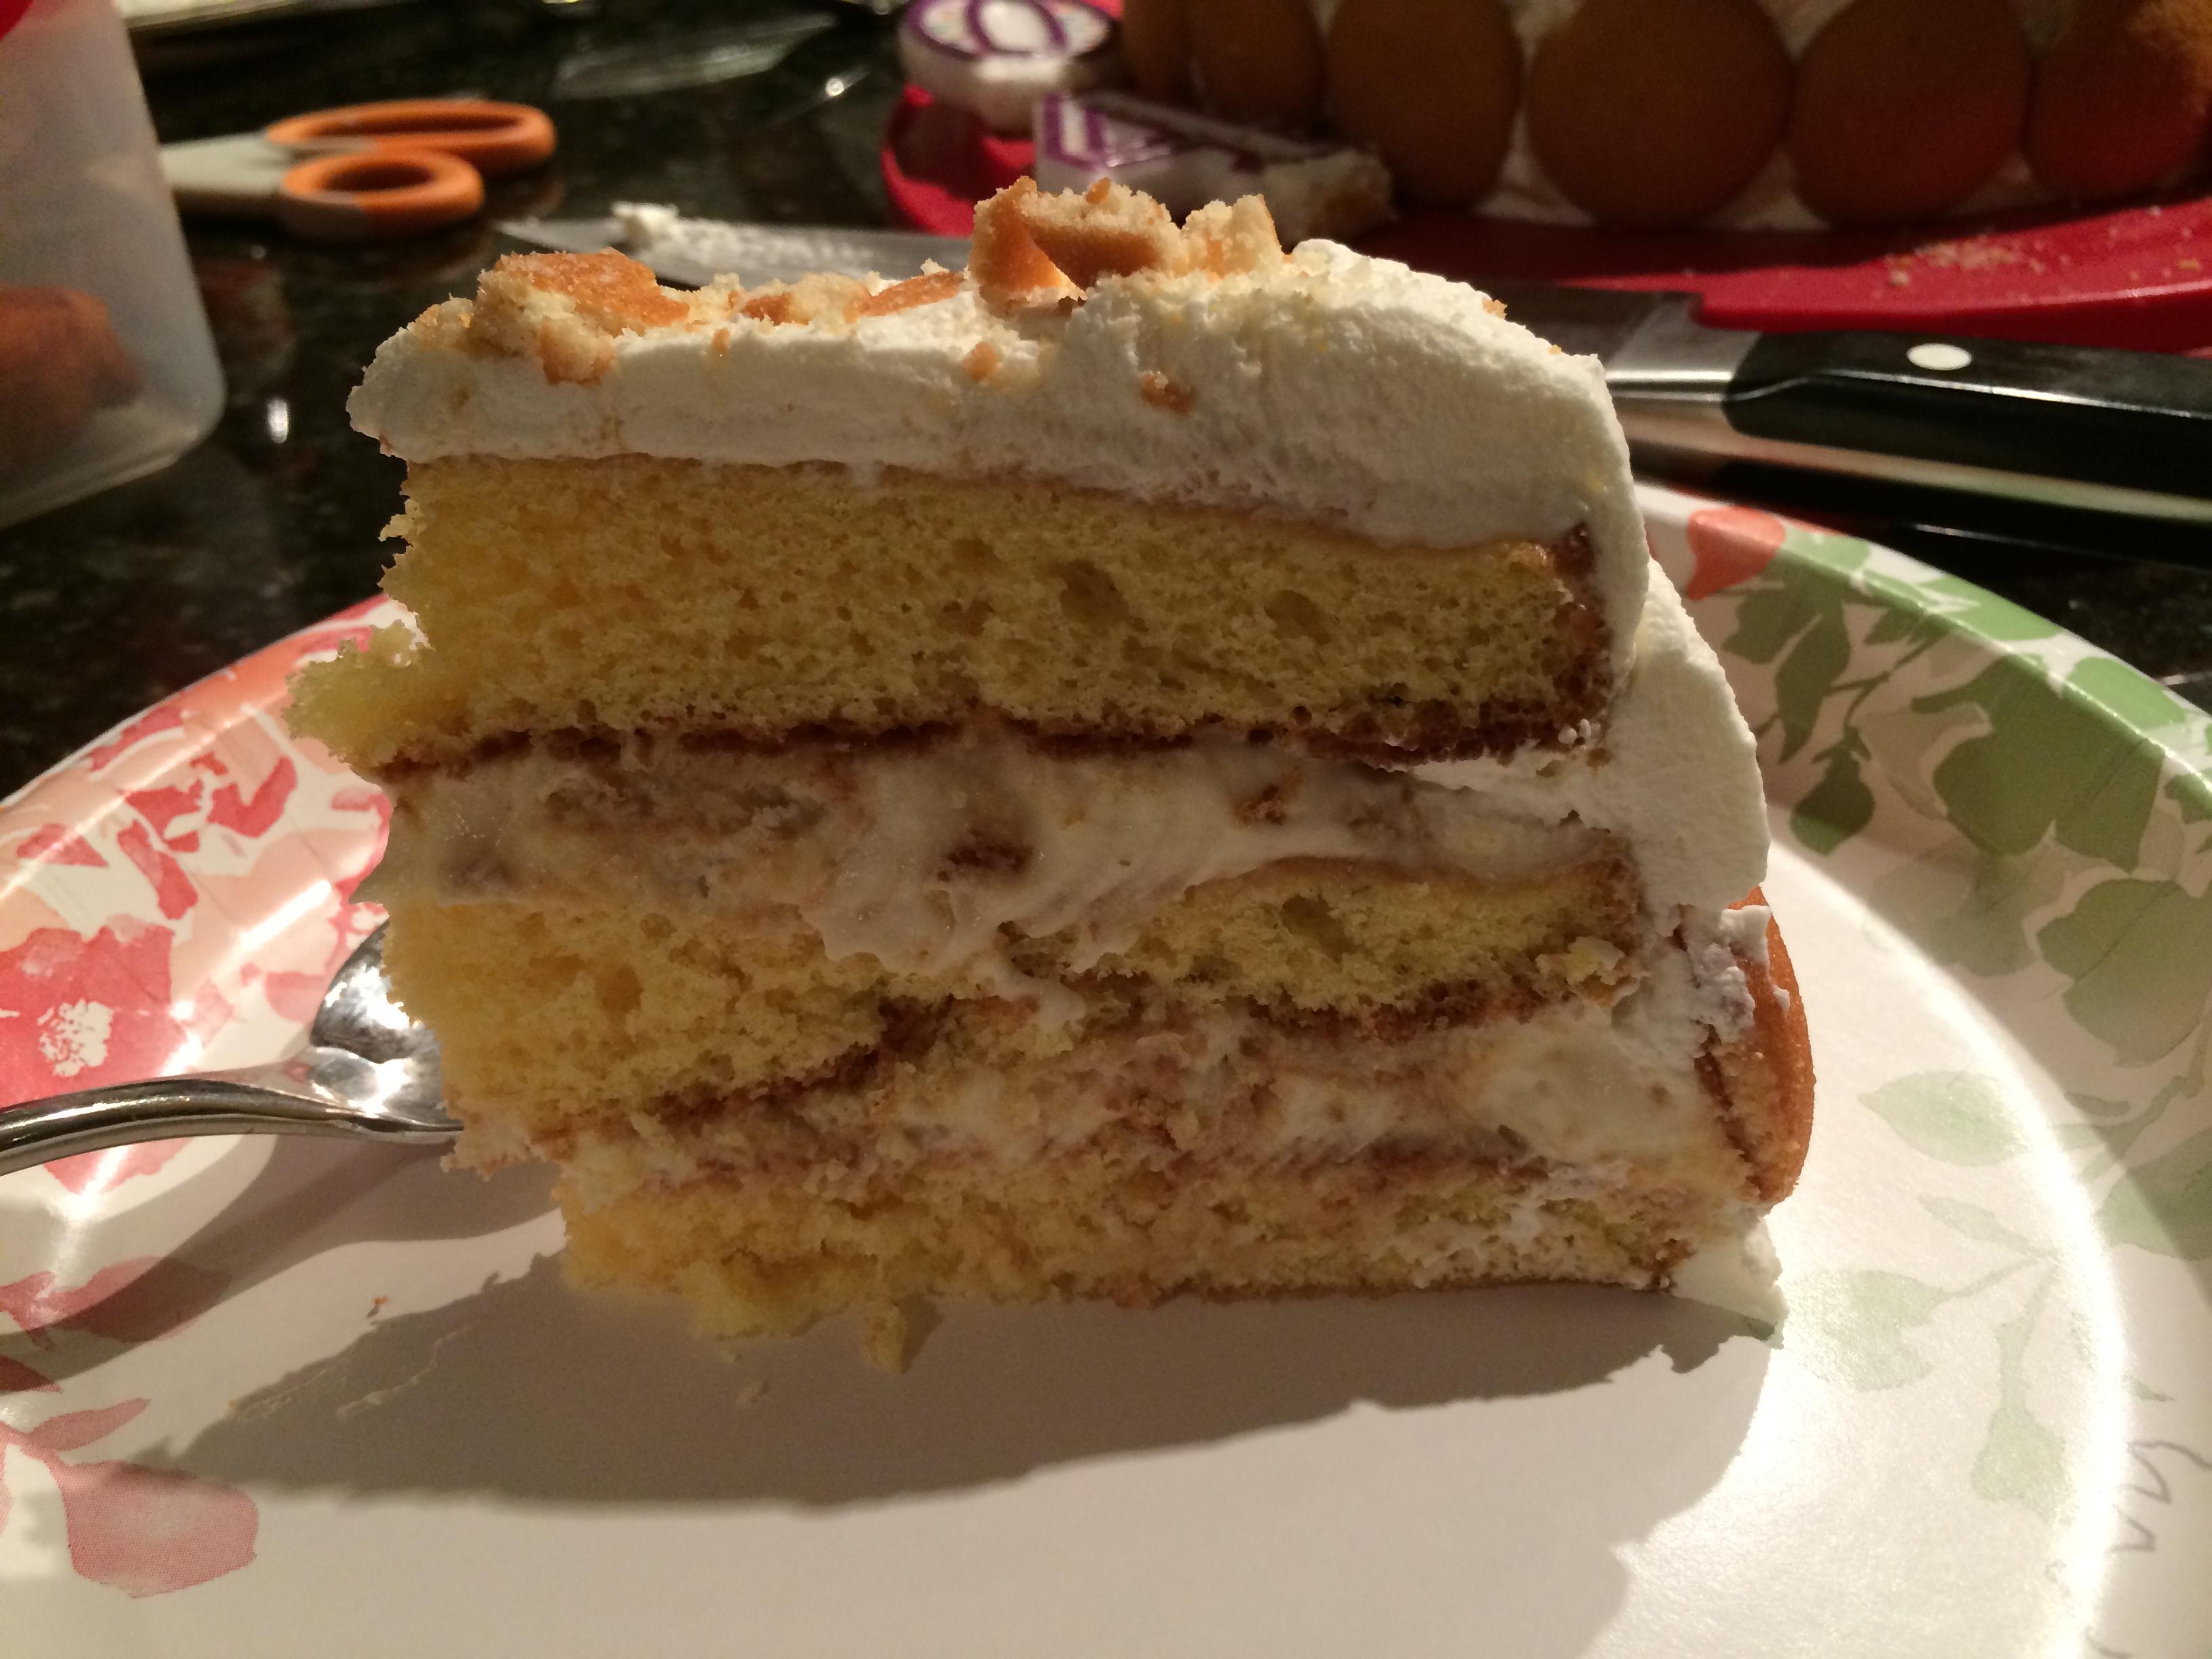 Layered Dessert Recipes With Cake Mix